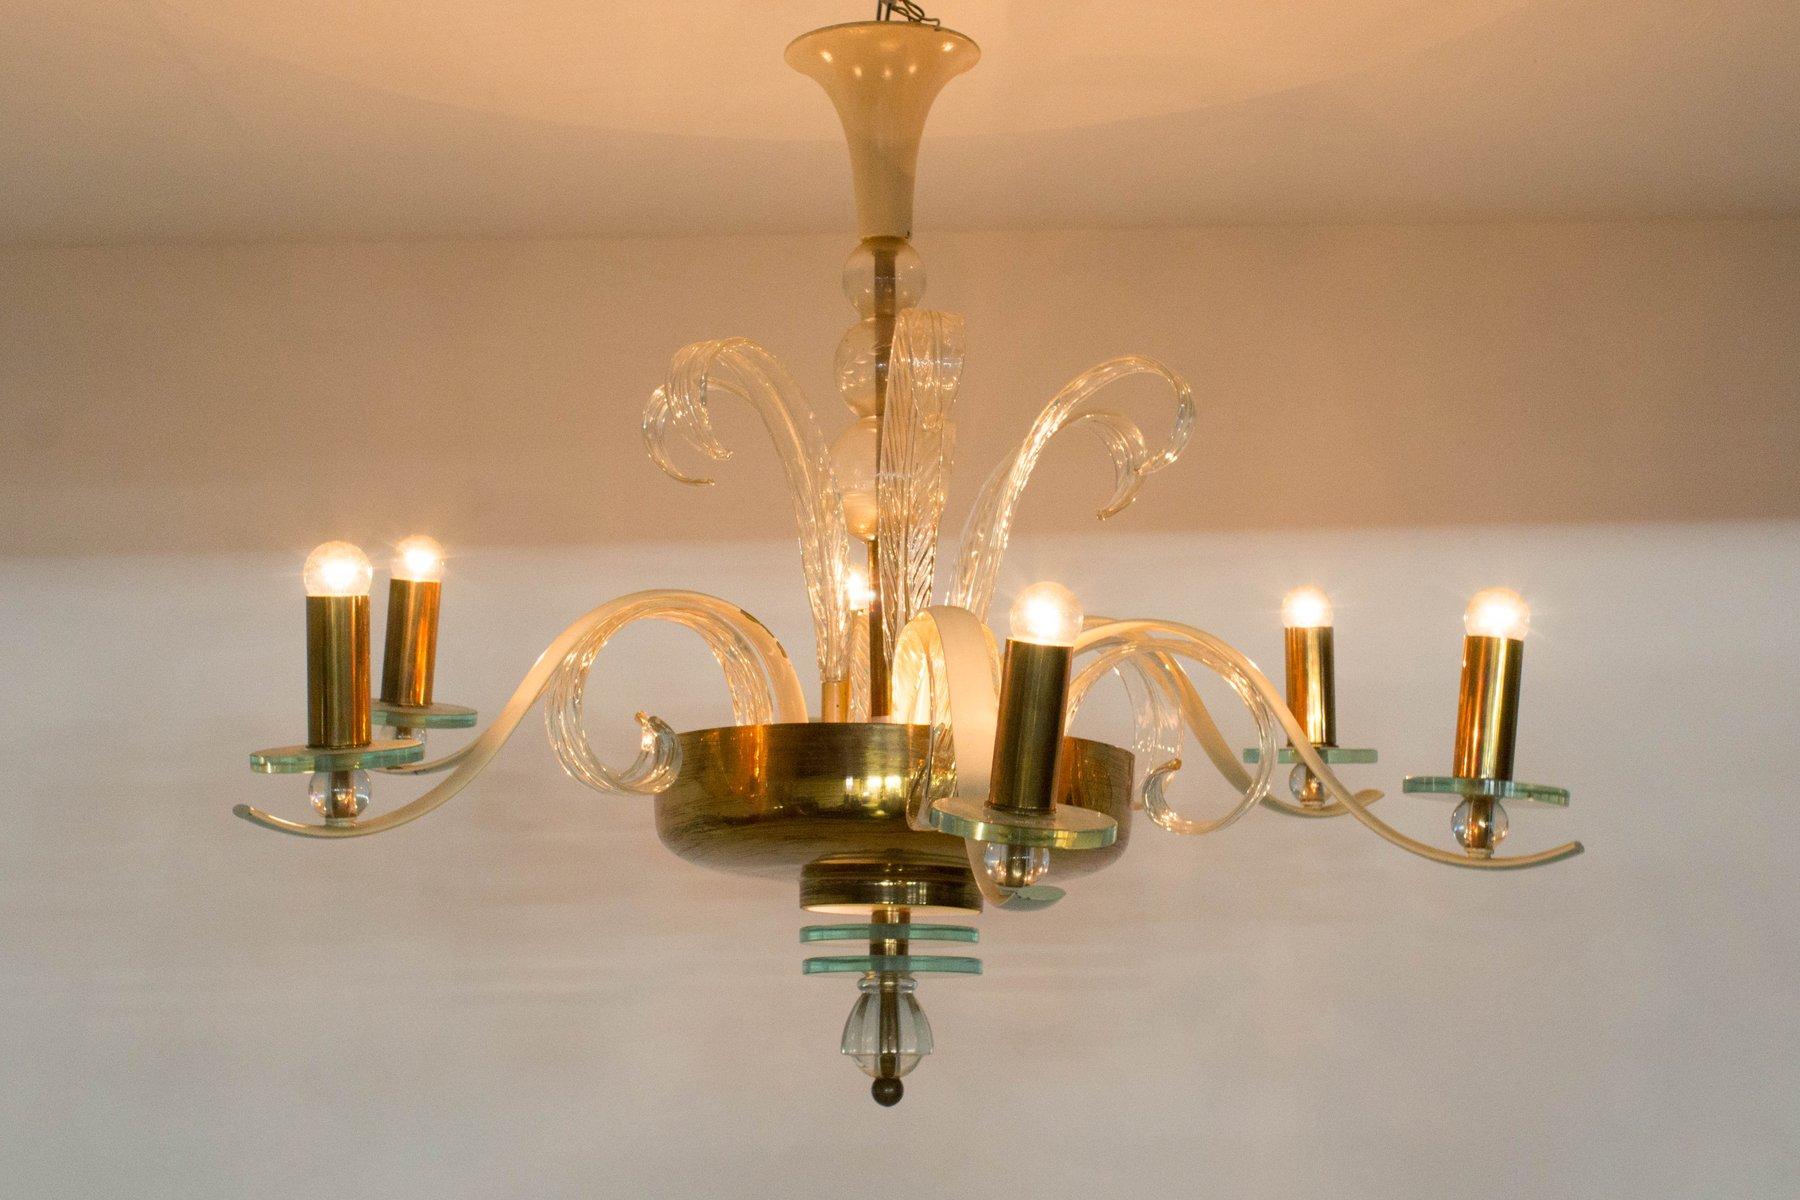 Italian Murano Glass Chandelier 1940s For Sale At Pamono